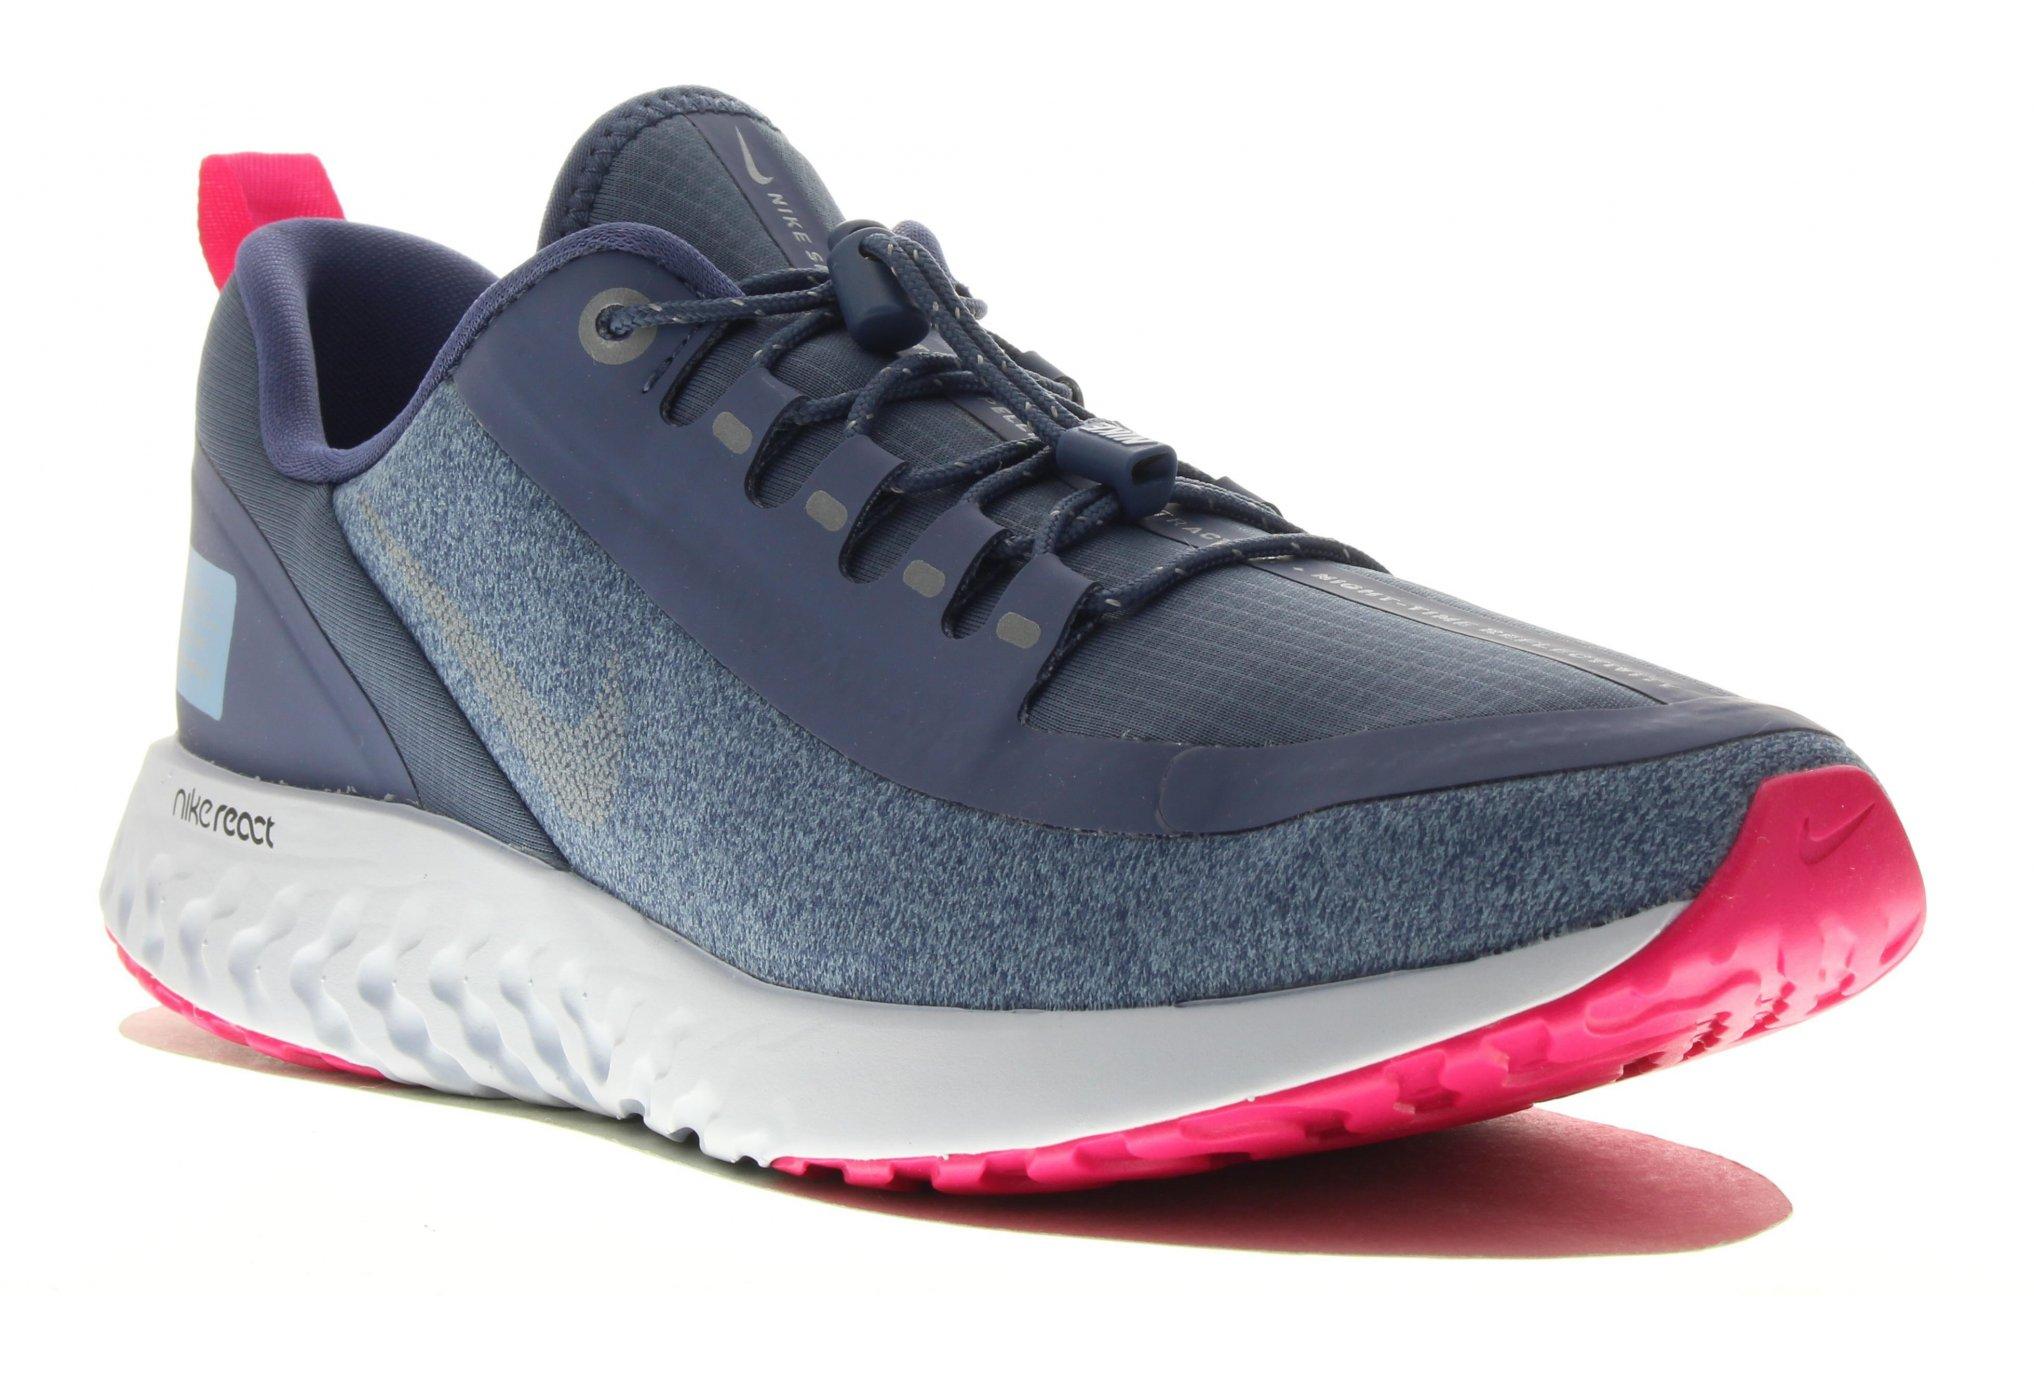 Nike Legend React Shield Fille Chaussures running femme